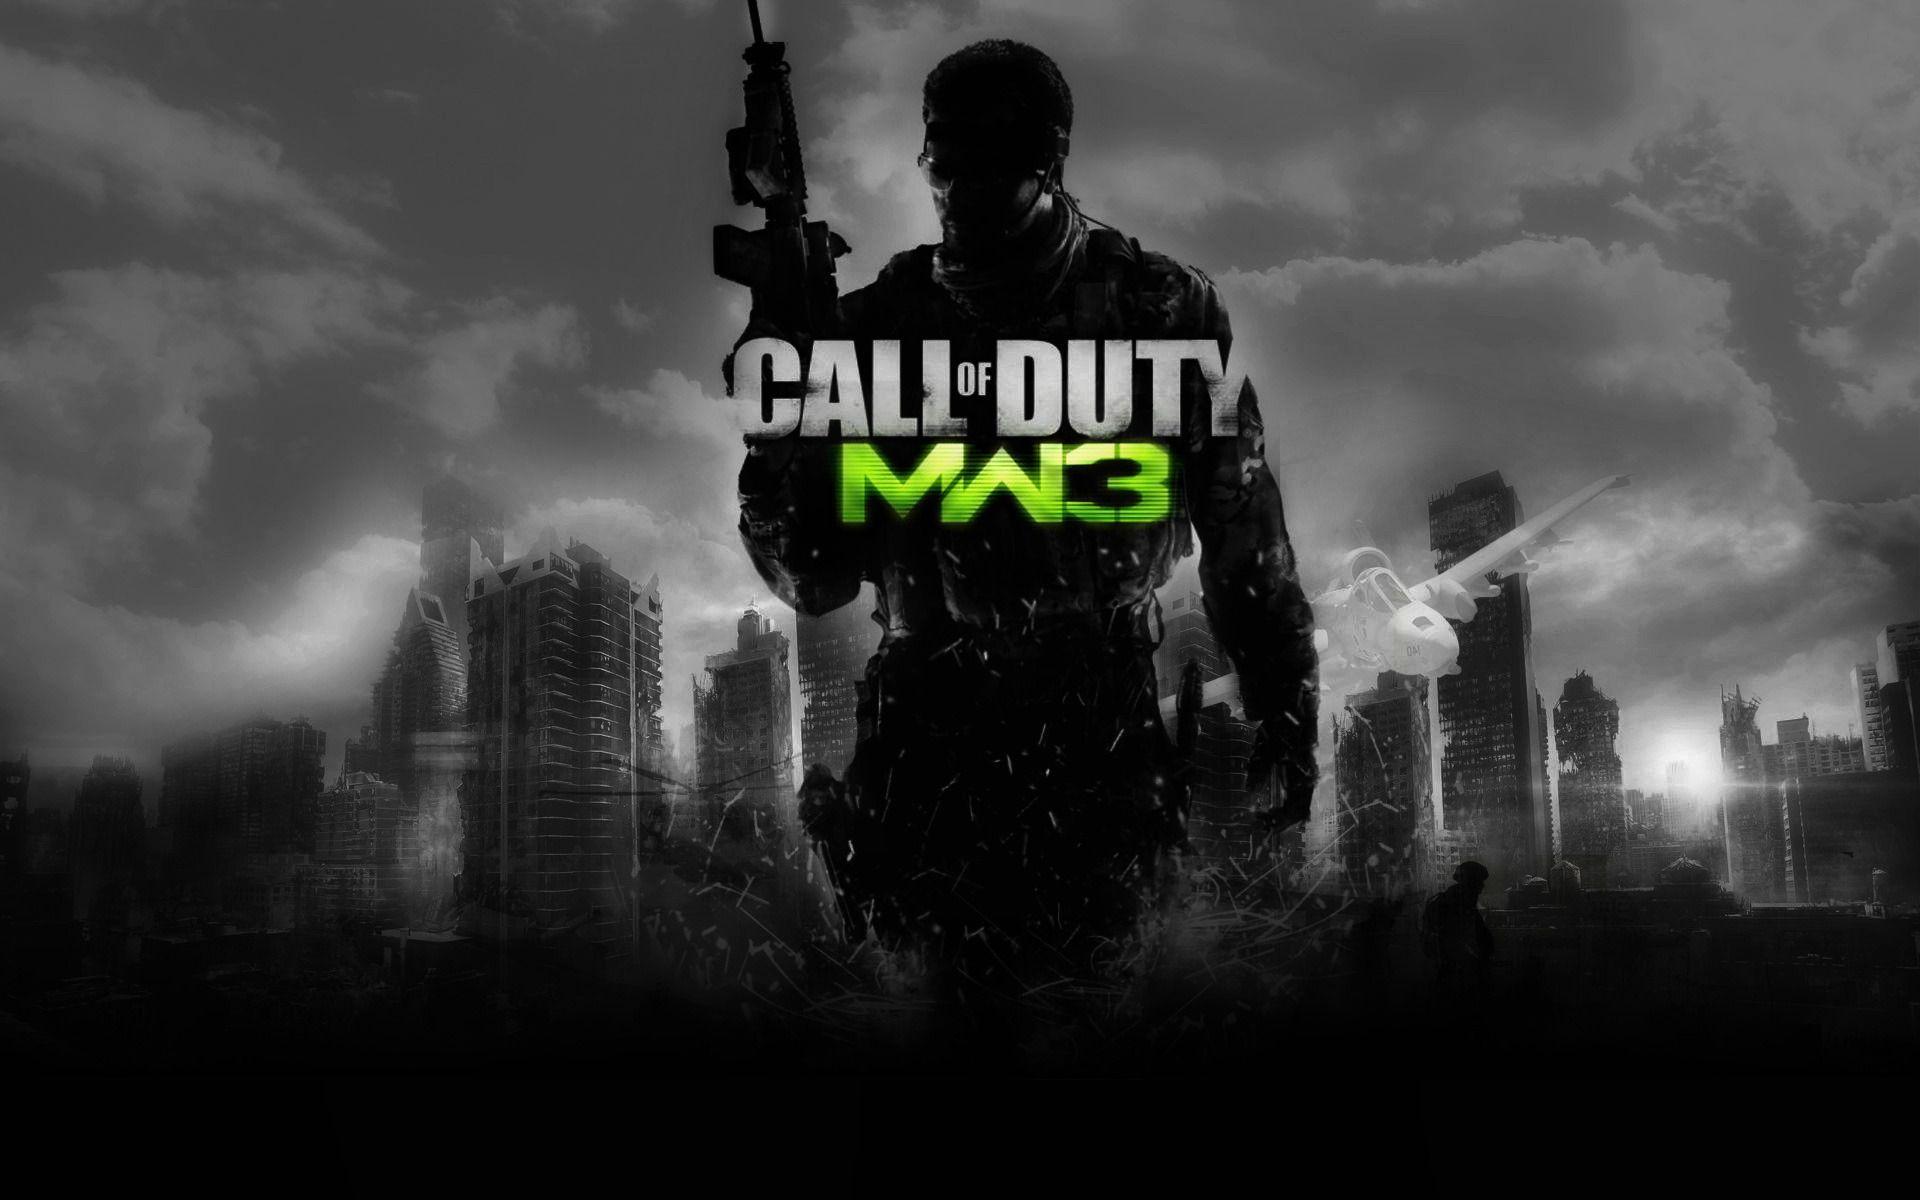 Call Of Duty Modern Warfare 3 Wallpapers Wallpaper Cave Call Of Duty Modern Warfare Warfare